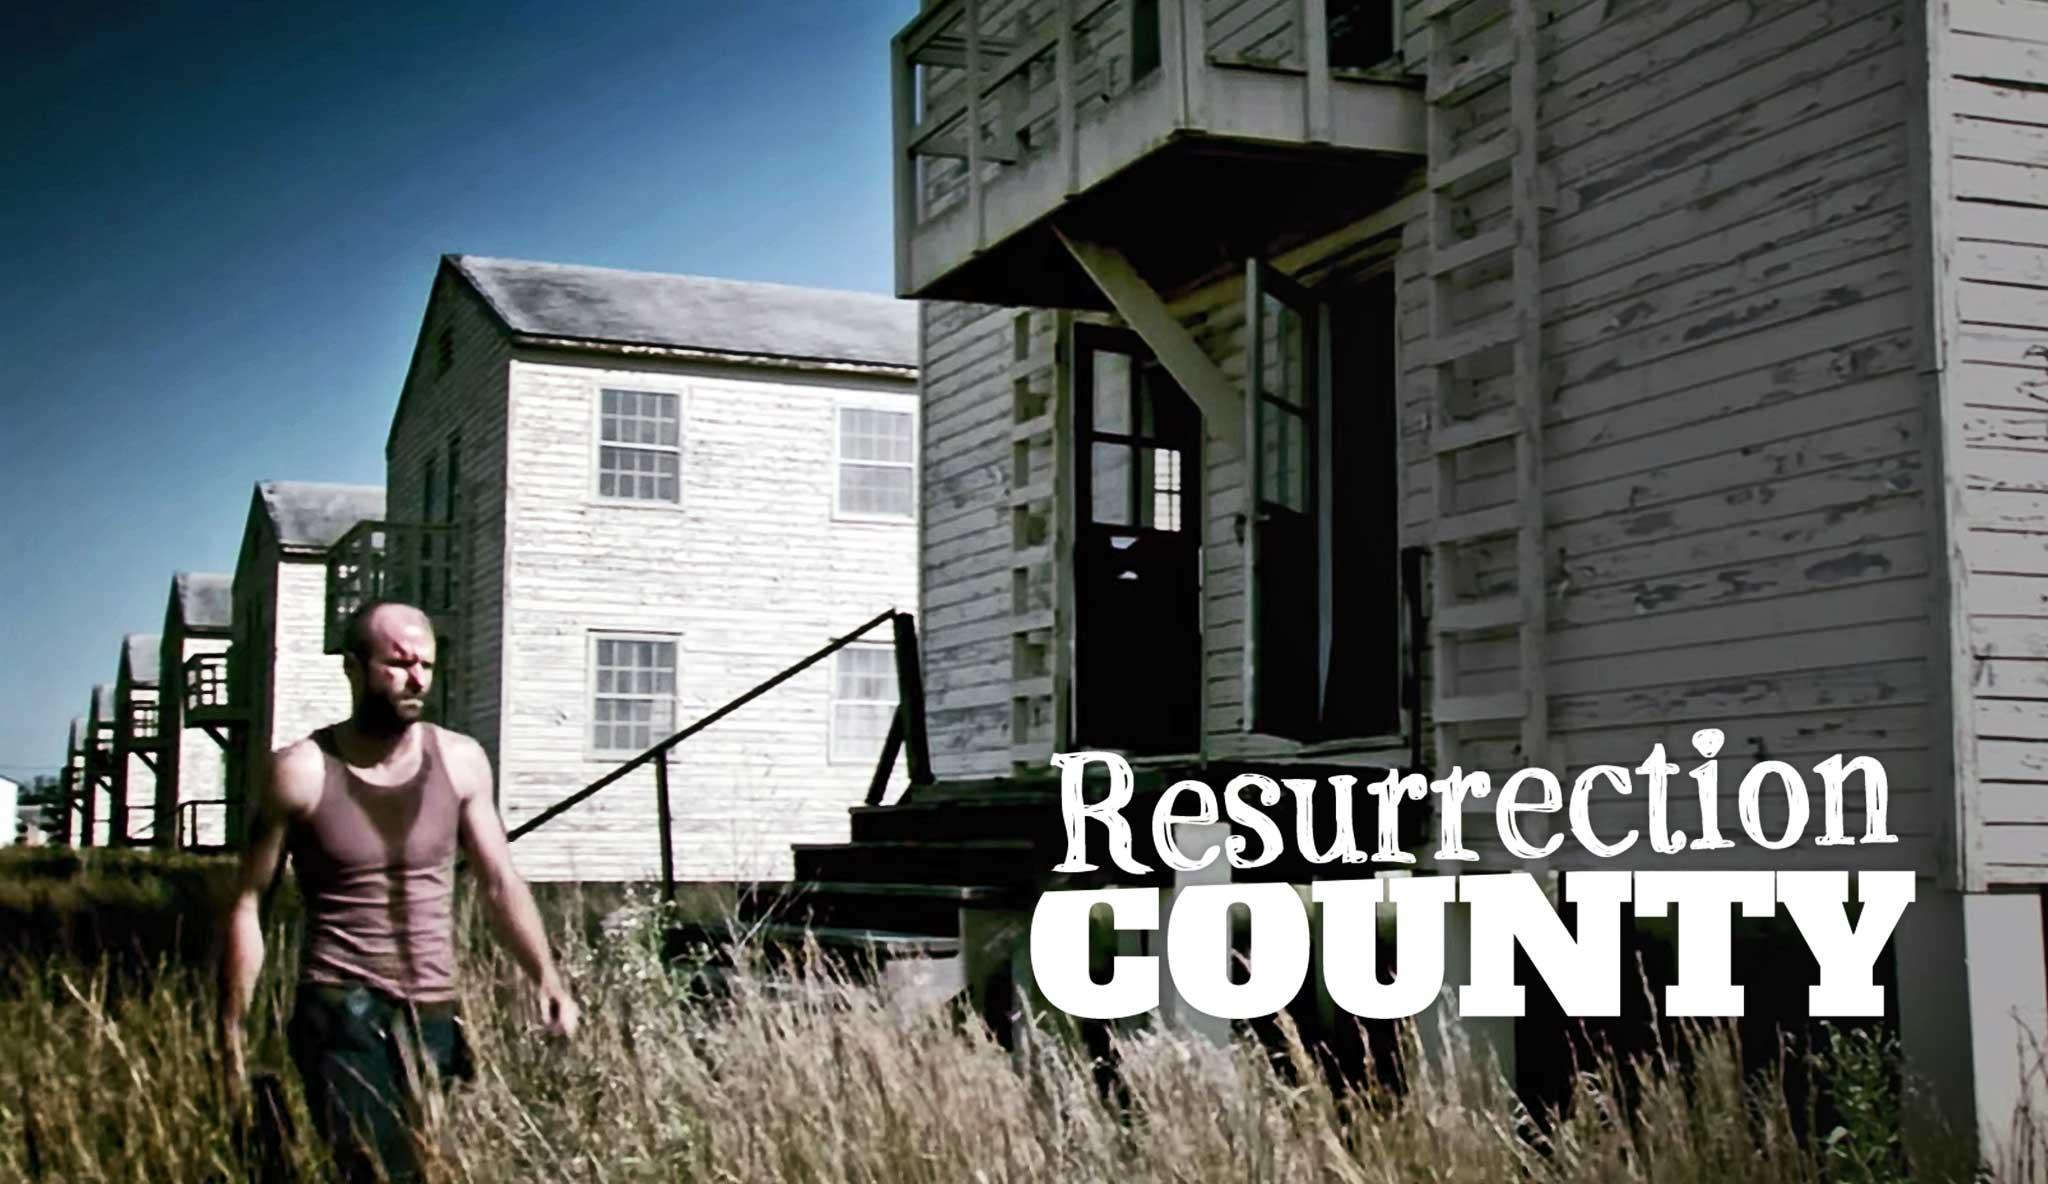 resurrection-country\header.jpg